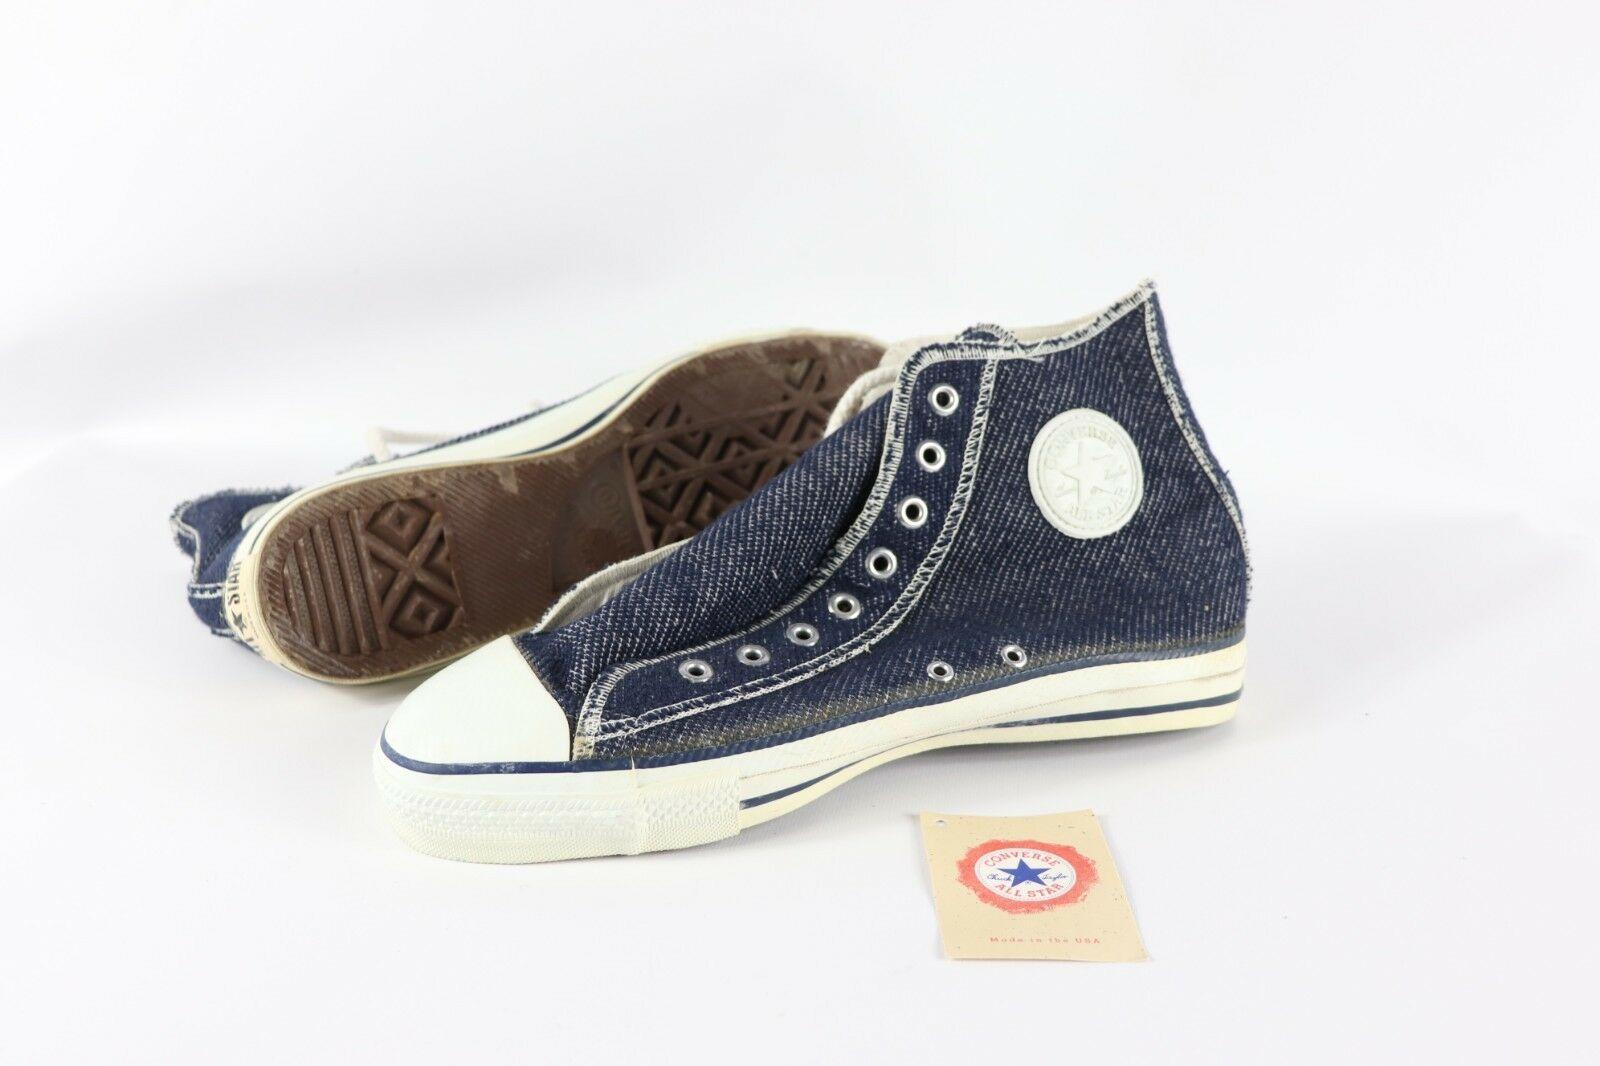 Vintage Neuf Converse Hommes 11 Chuck Taylor All Star à L'envers Chaussures